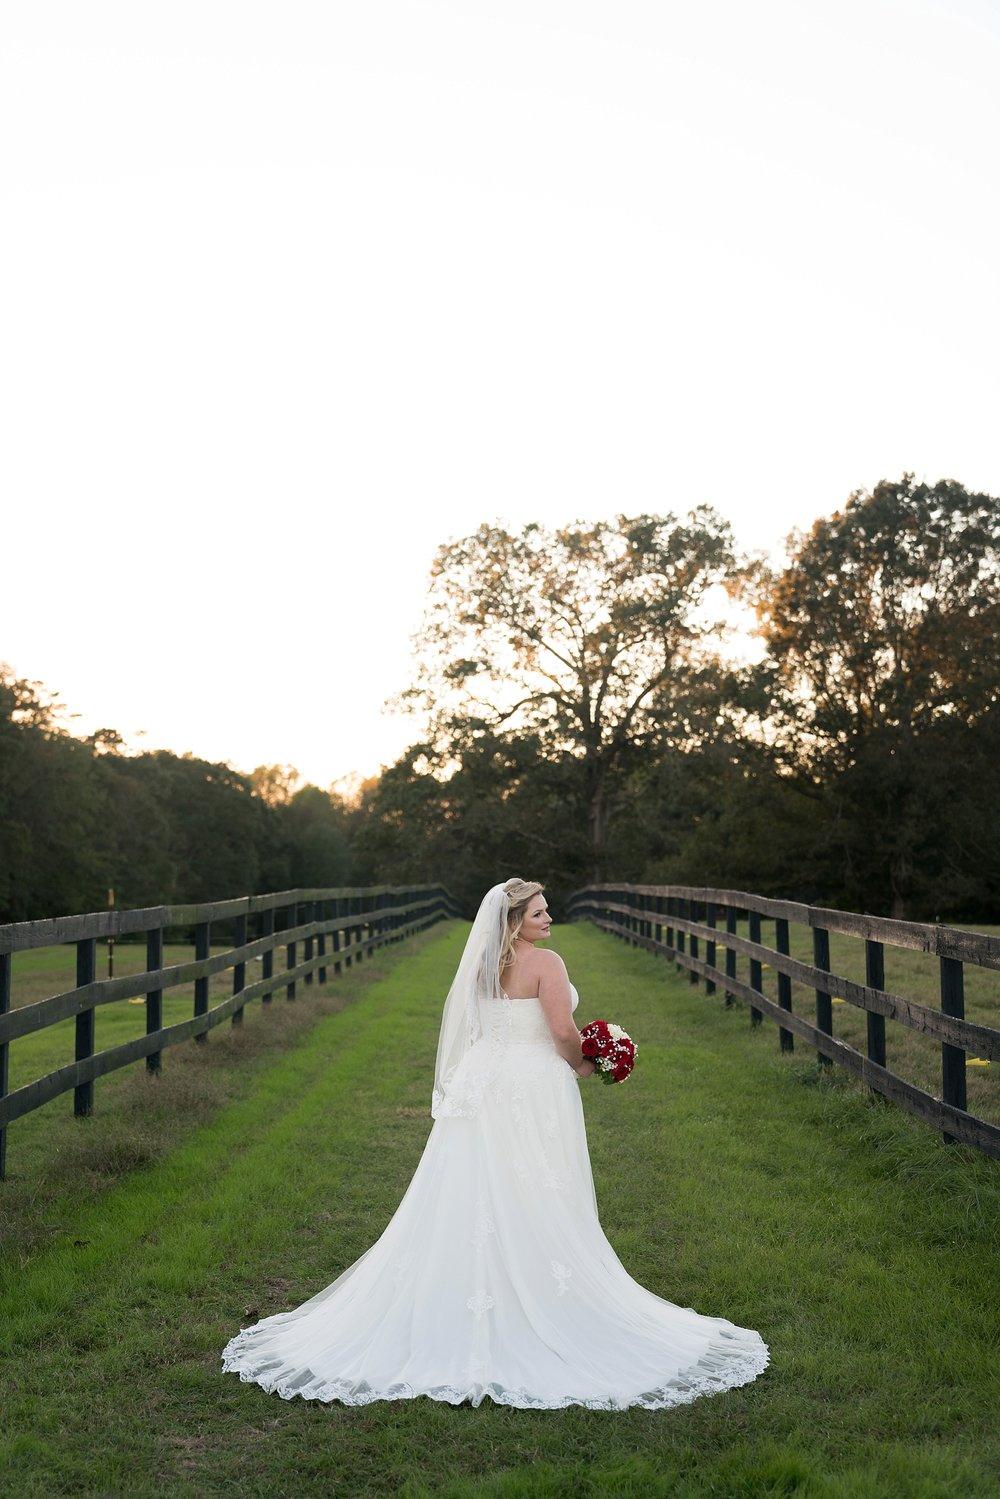 Little-Herb-House-Wedding-Photographer-069.jpg